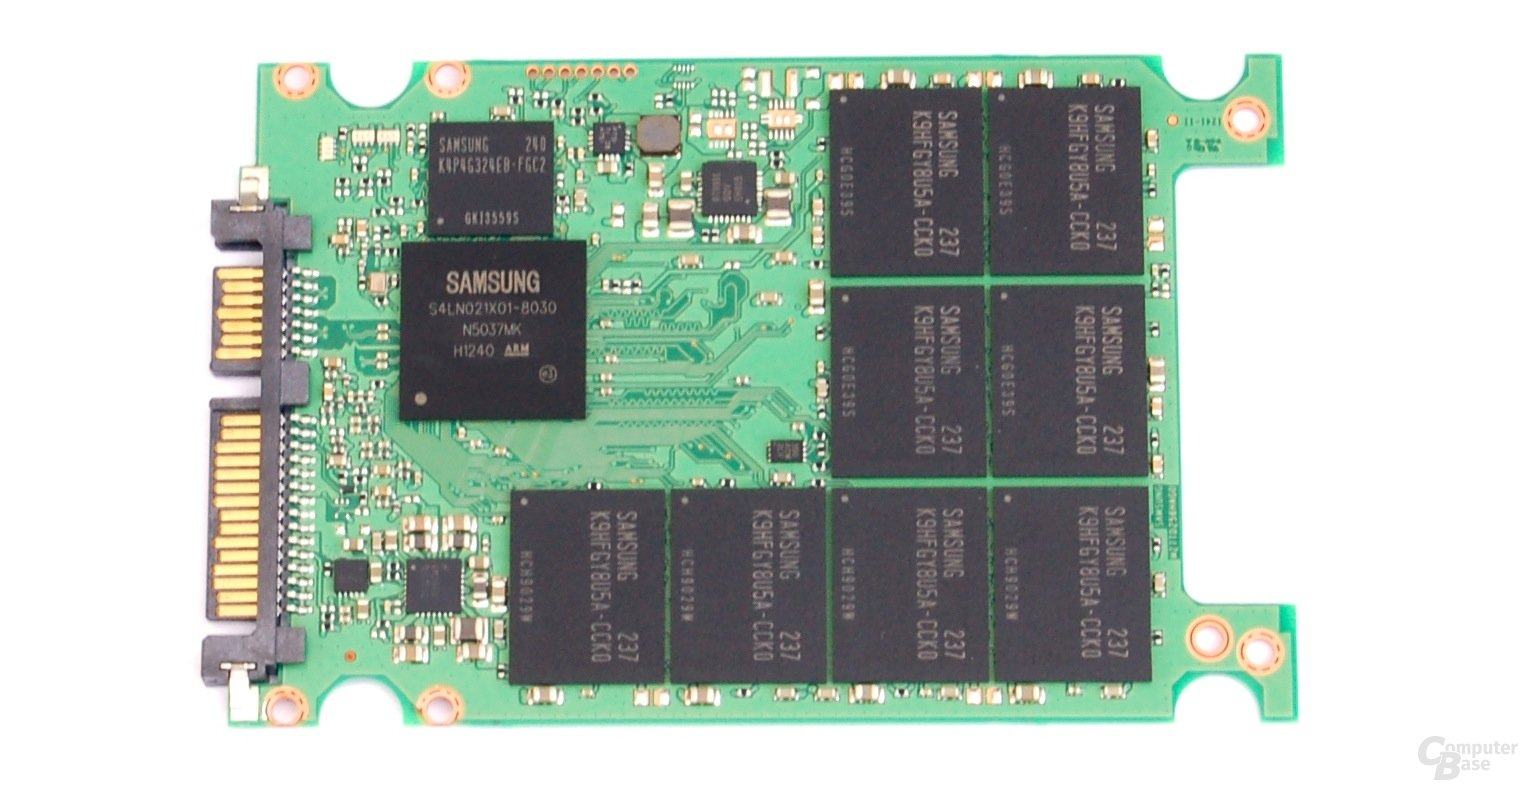 Samsung Serie 840 Pro